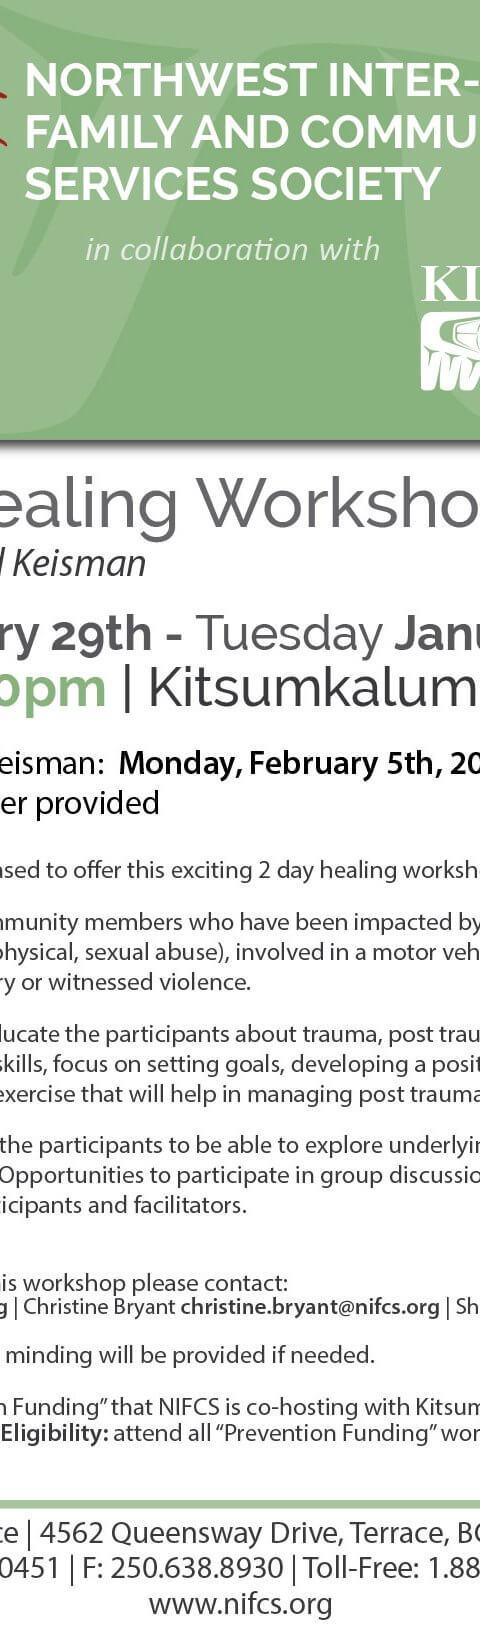 Elders Archives | Page 2 of 6 | Kitsumkalum, a Galts\'ap (community ...